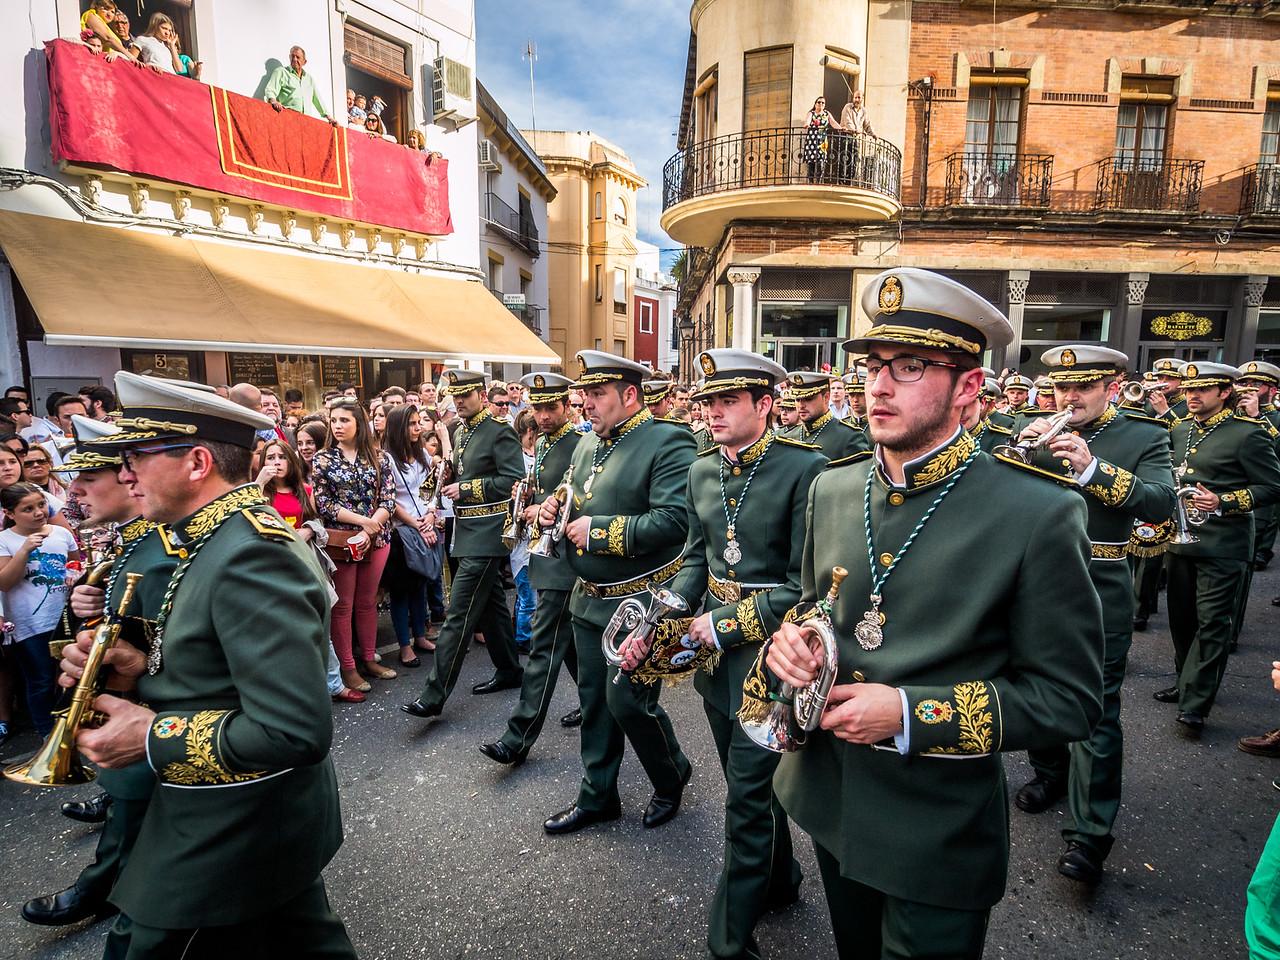 The Passing Musicians, Semana Santa, Córdoba, Spain